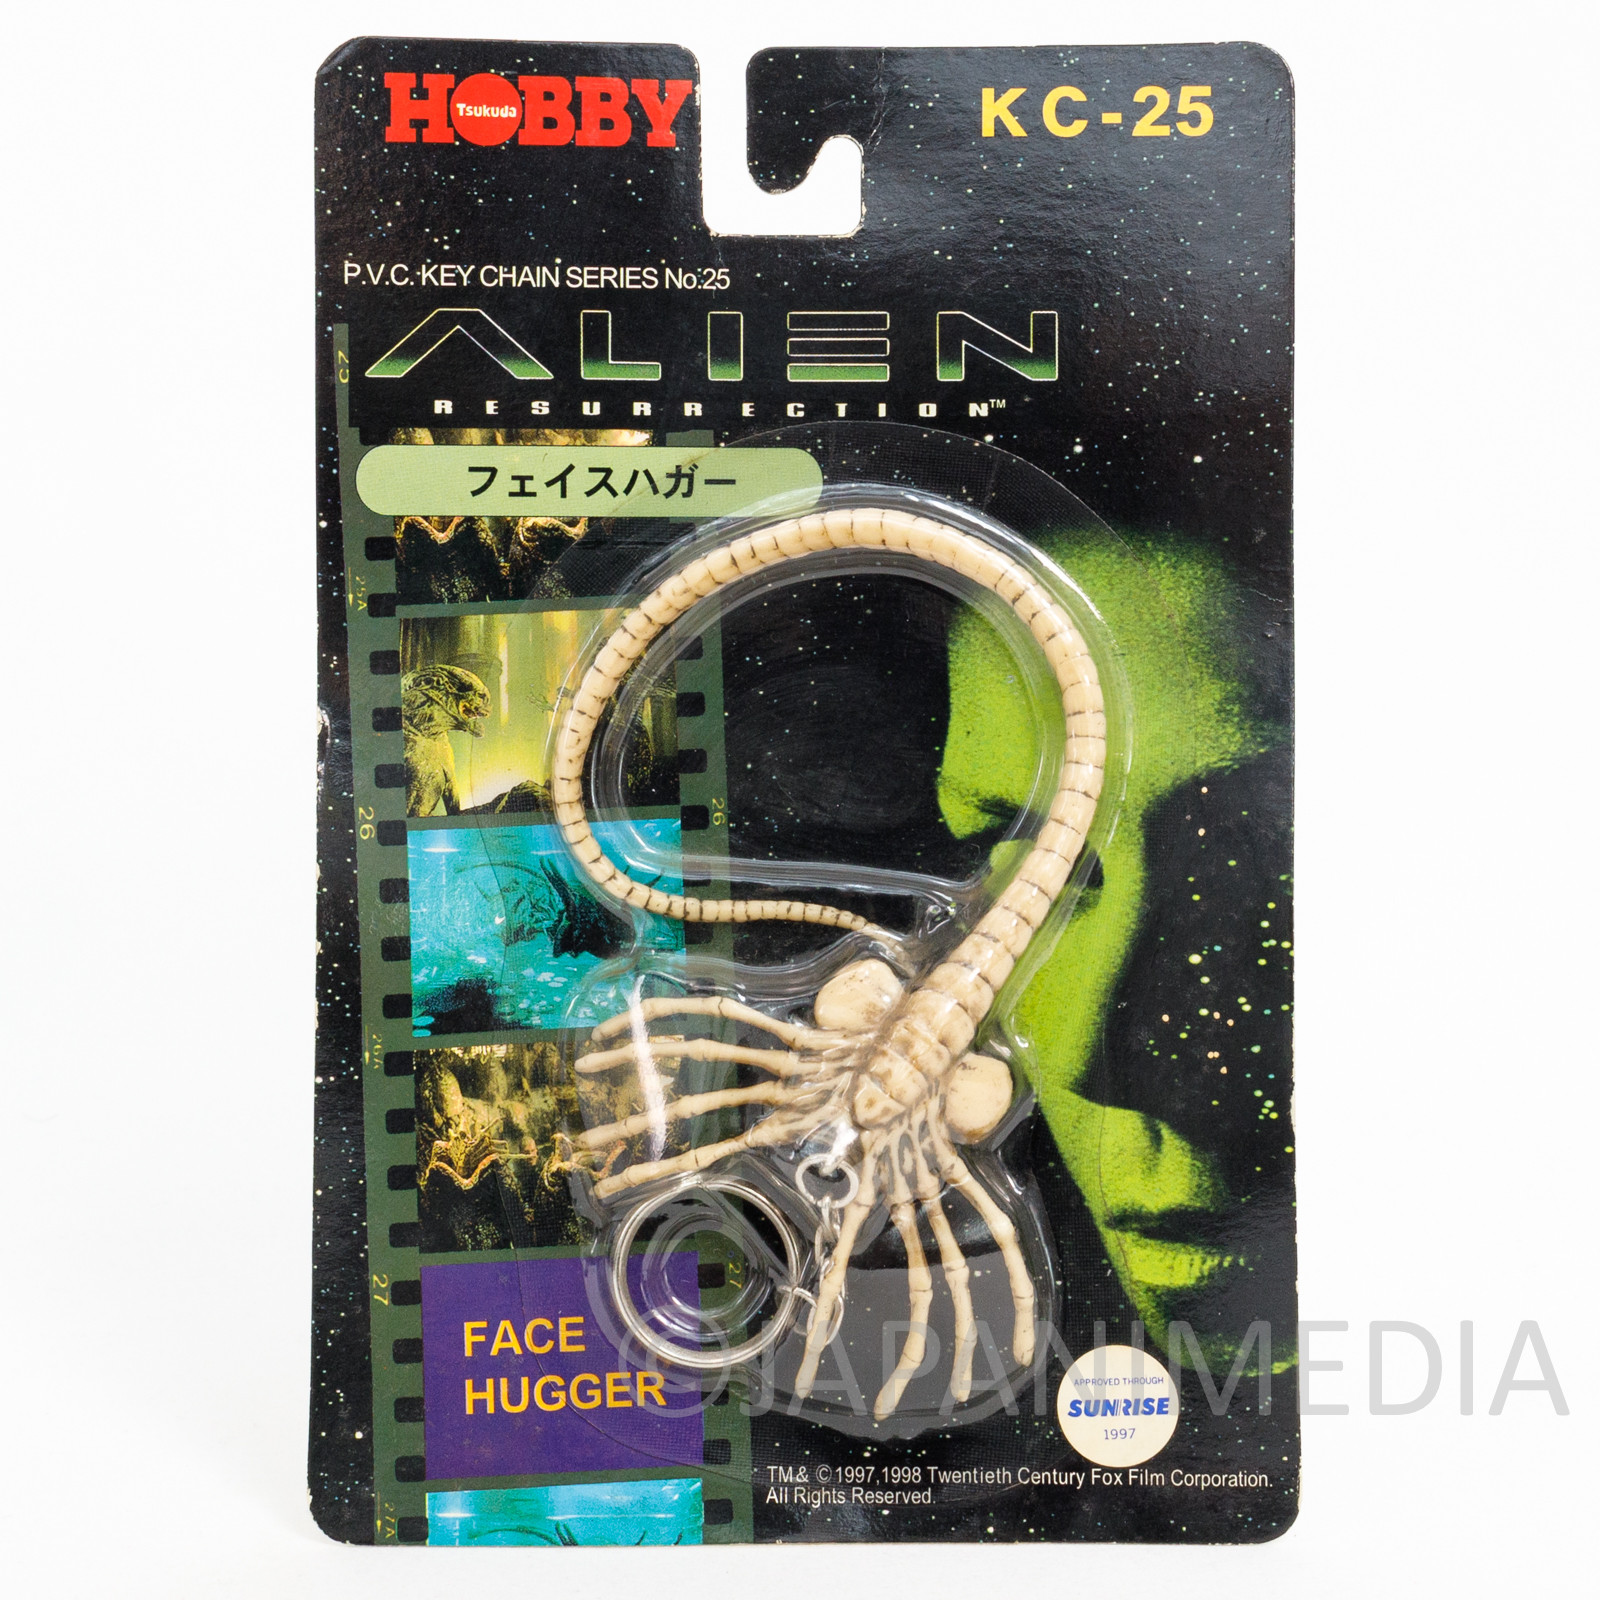 ALIEN Resurrestion Face Hugger Figure Key Chain Tsukuda Hobby KC-25